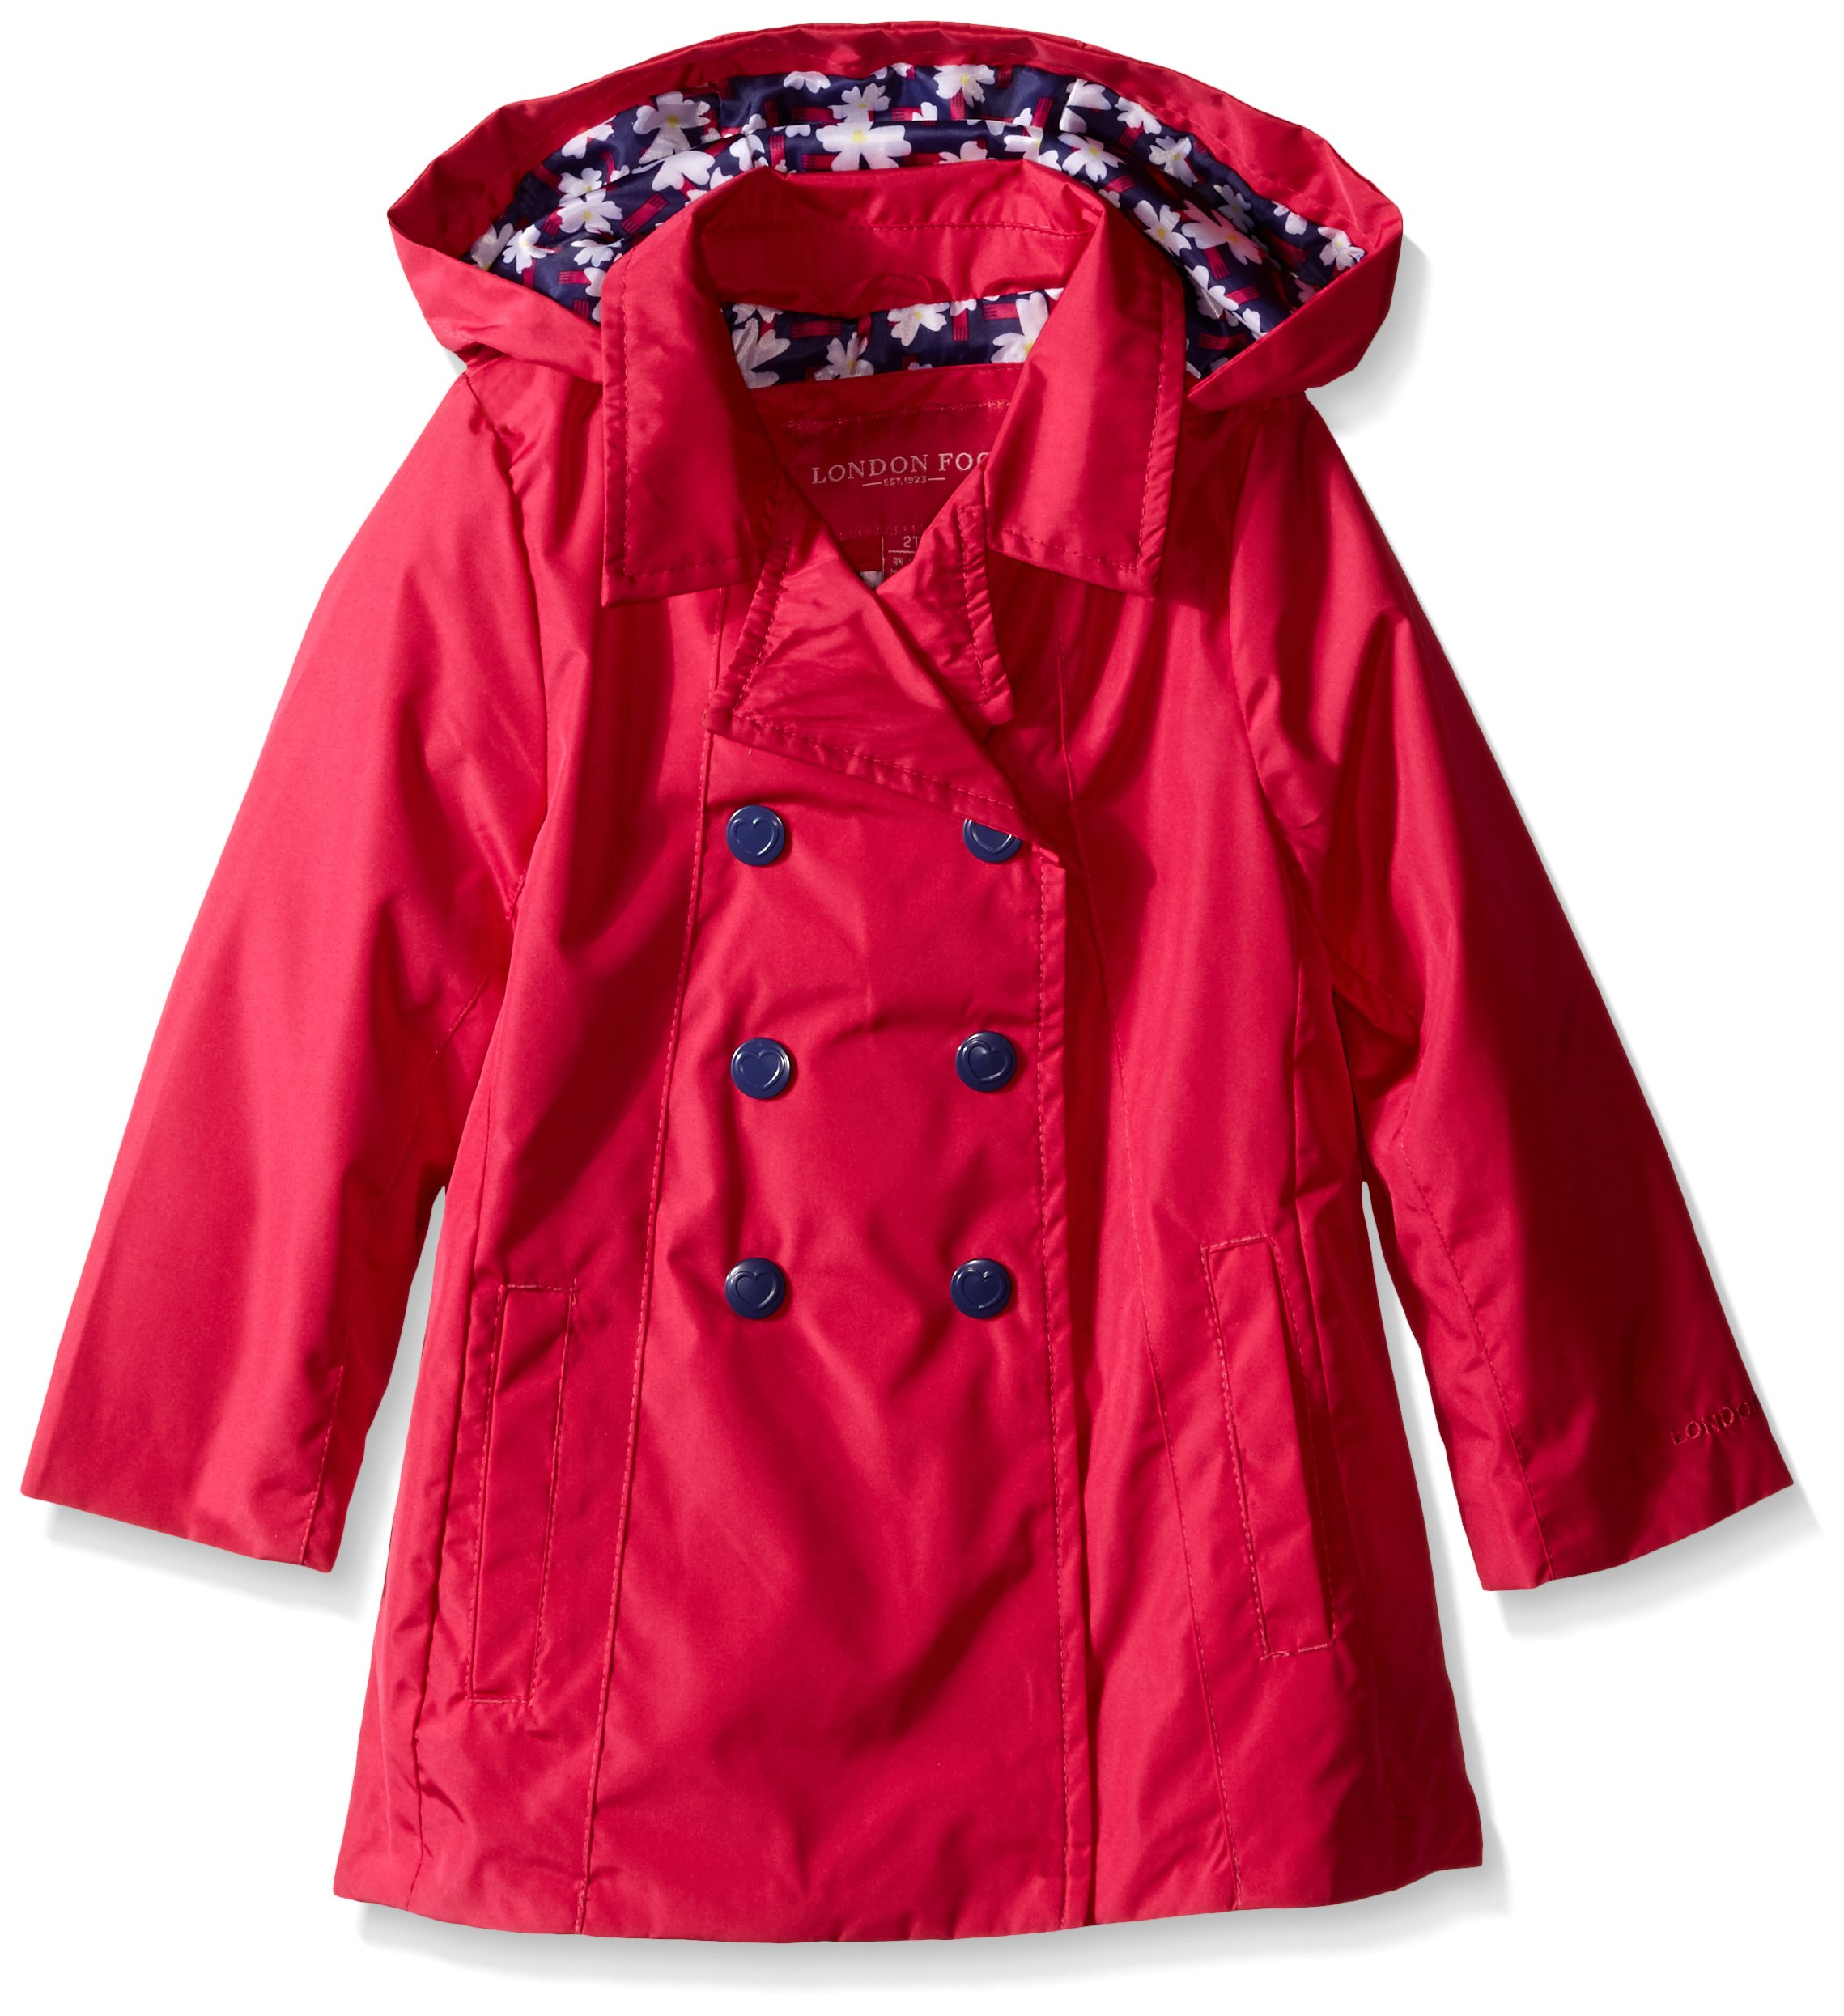 London Fog Girls Enhanced Radiance Solid Trench Coat Fuchsia Toddler Girls 2T 6